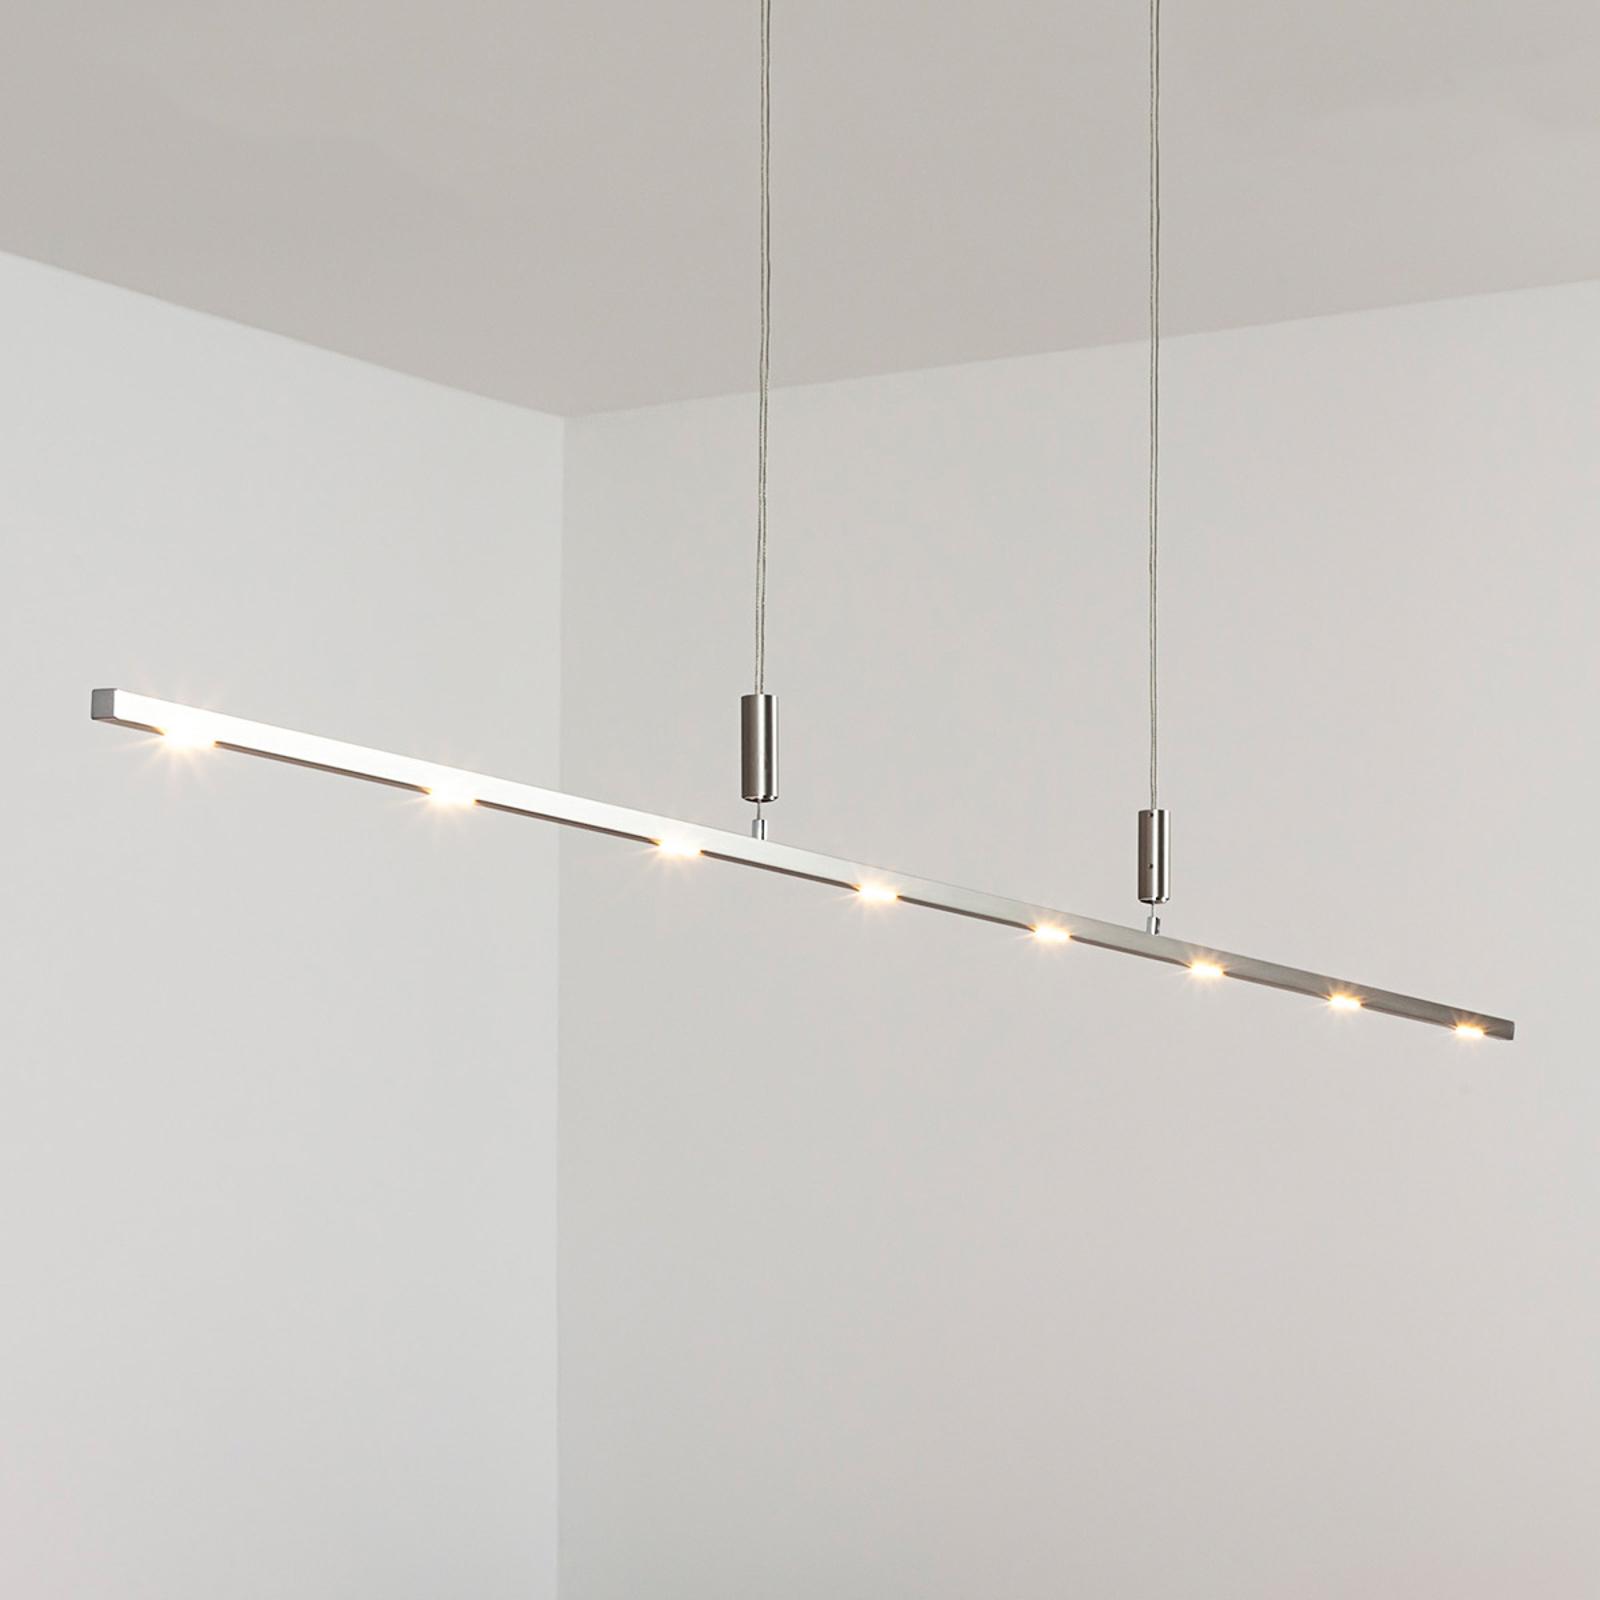 180 cm - slank LED-hengelampe Tolu, dimmbar